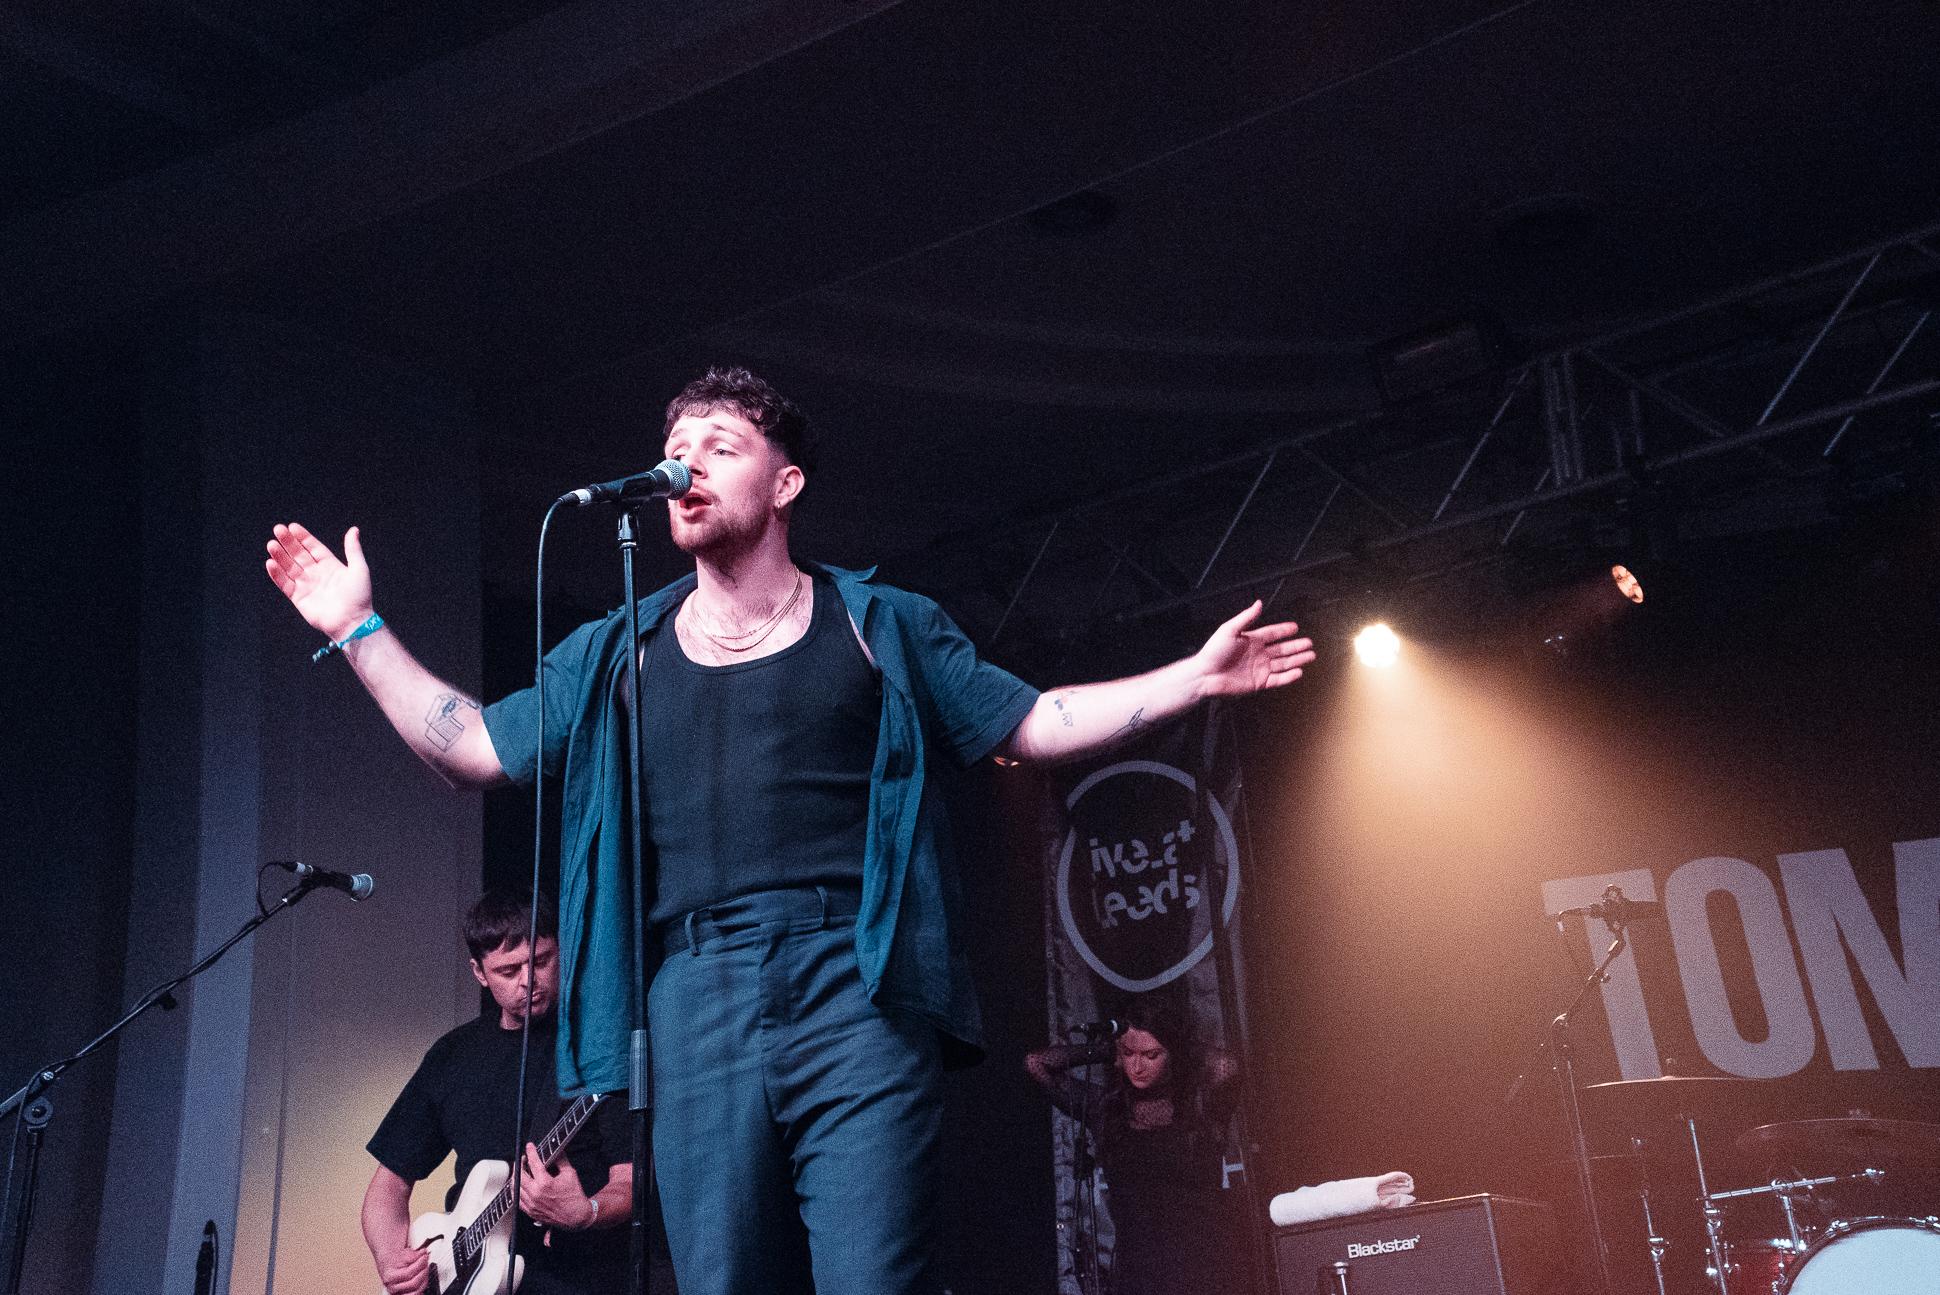 Live At Leeds 2019 - Tom Grennan_-10.jpg